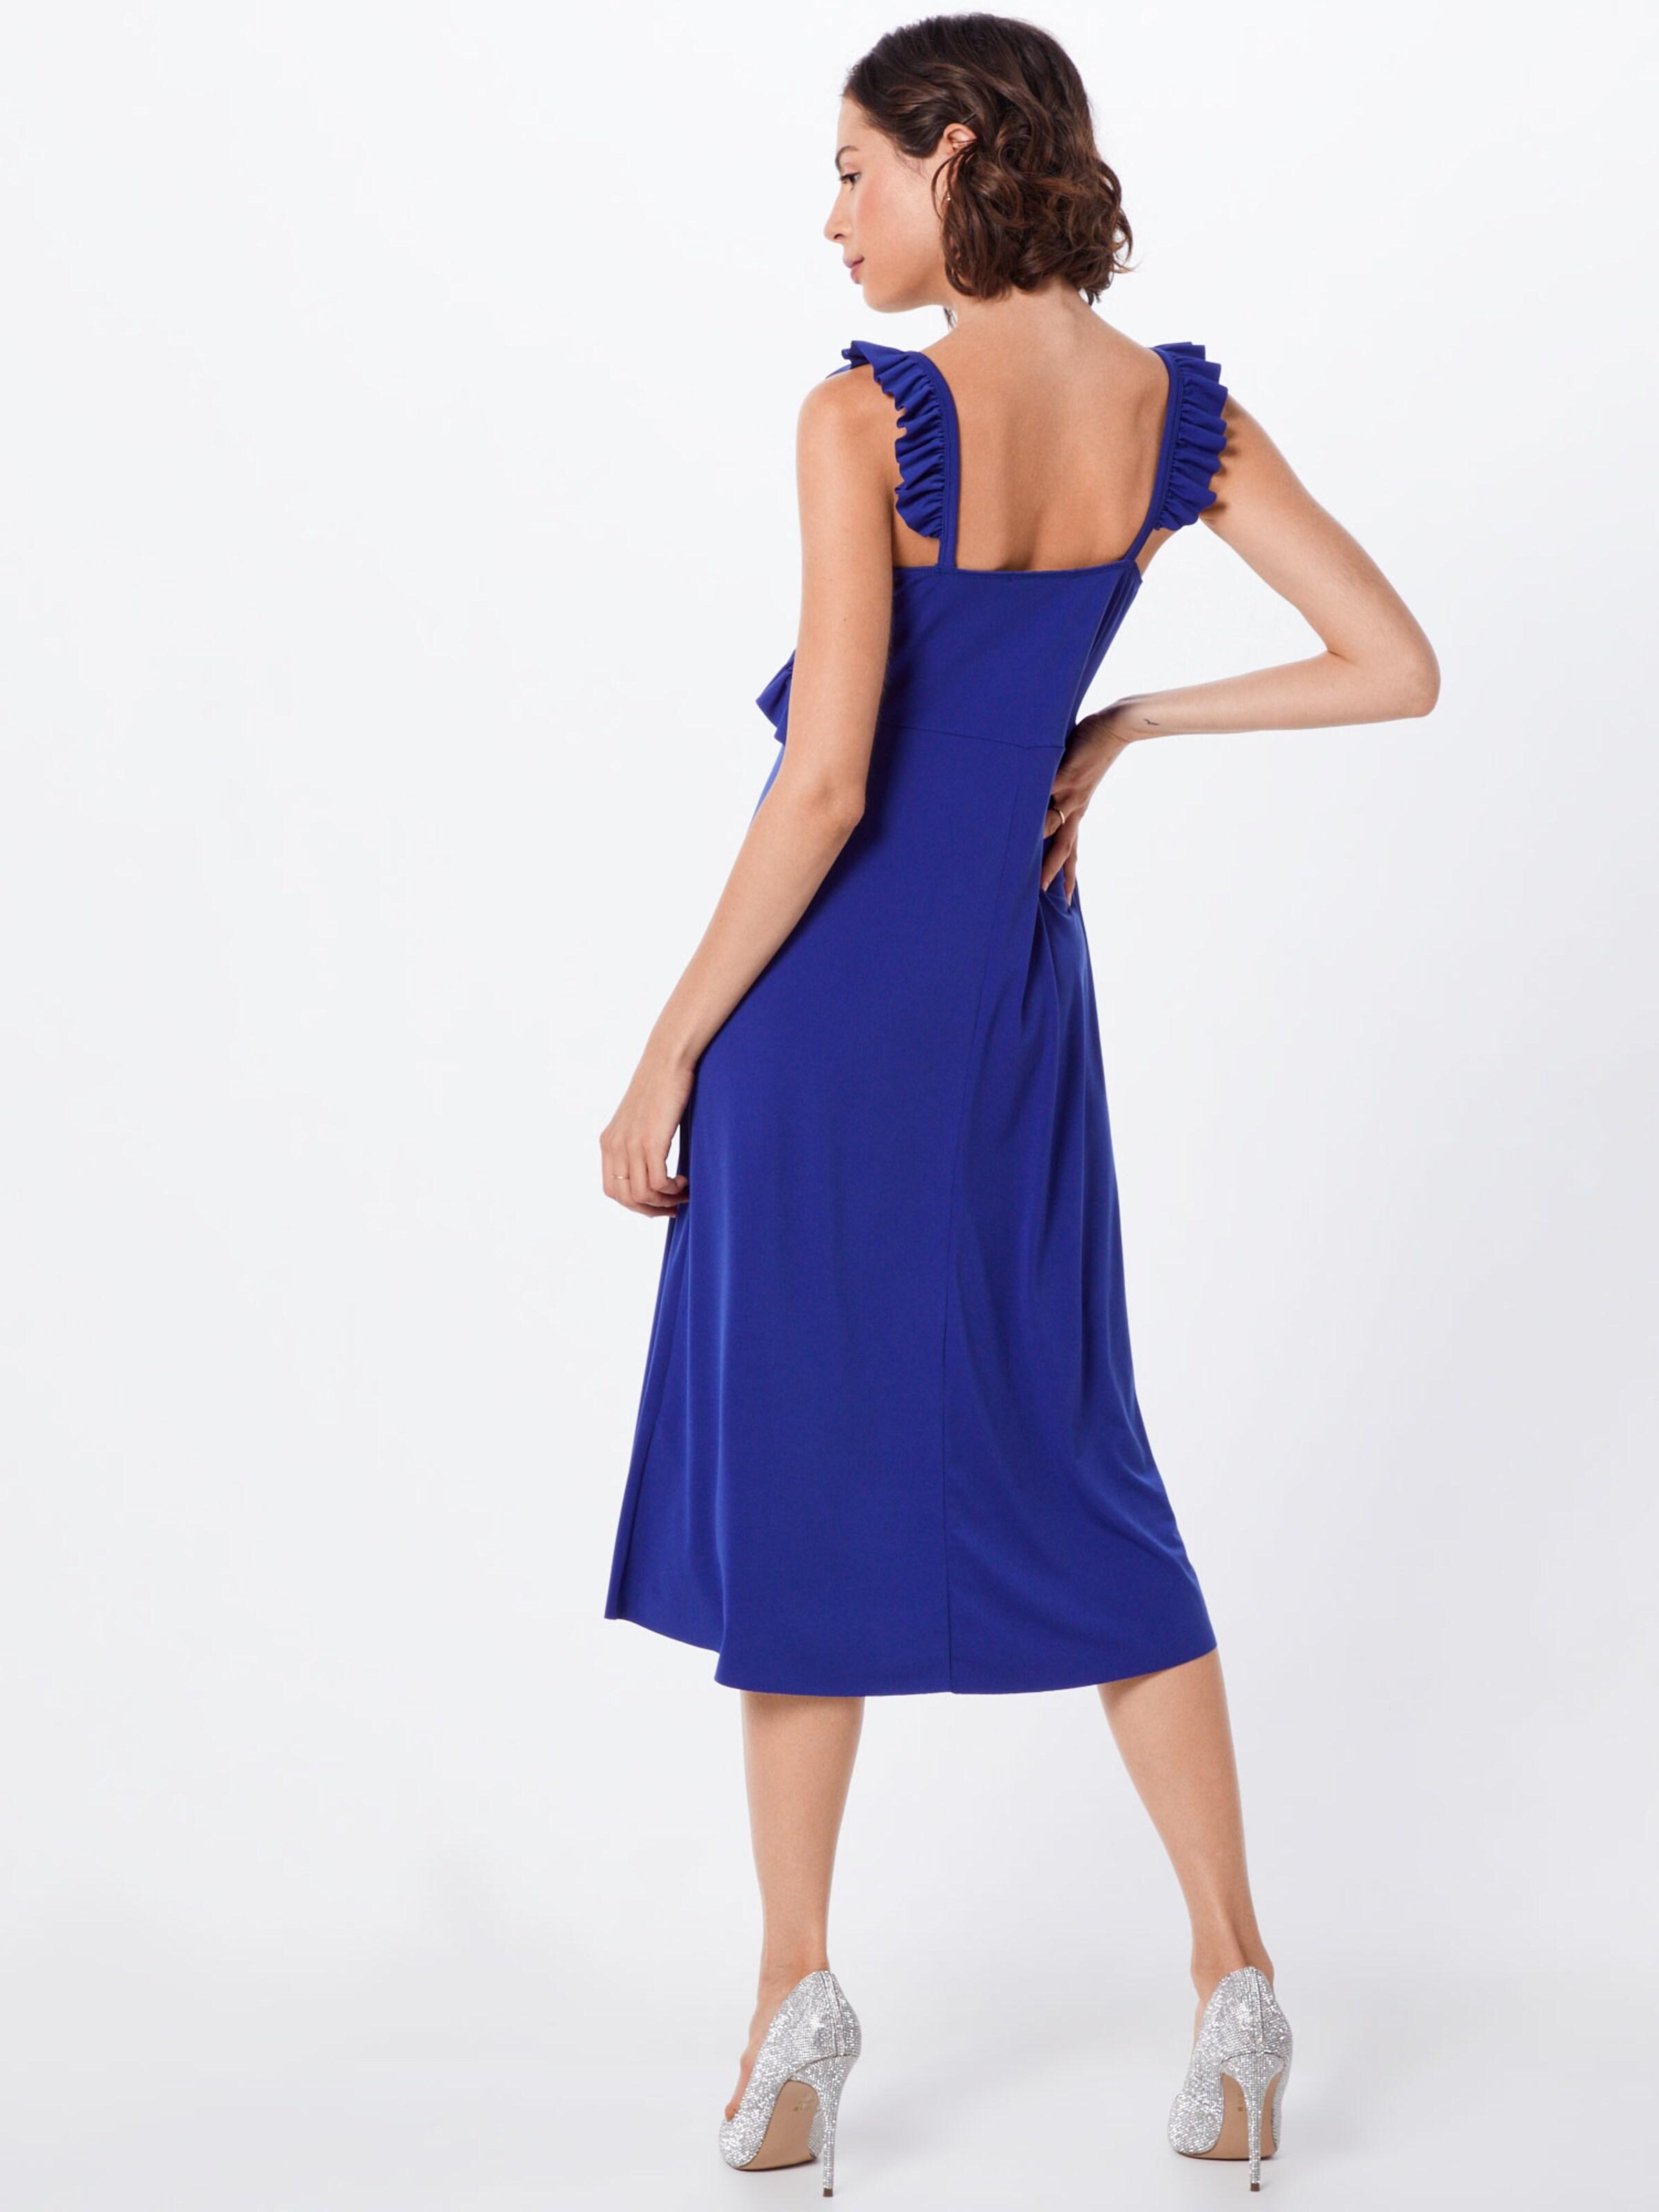 Robe You En Bleu About 'nelly' shCxQrtd